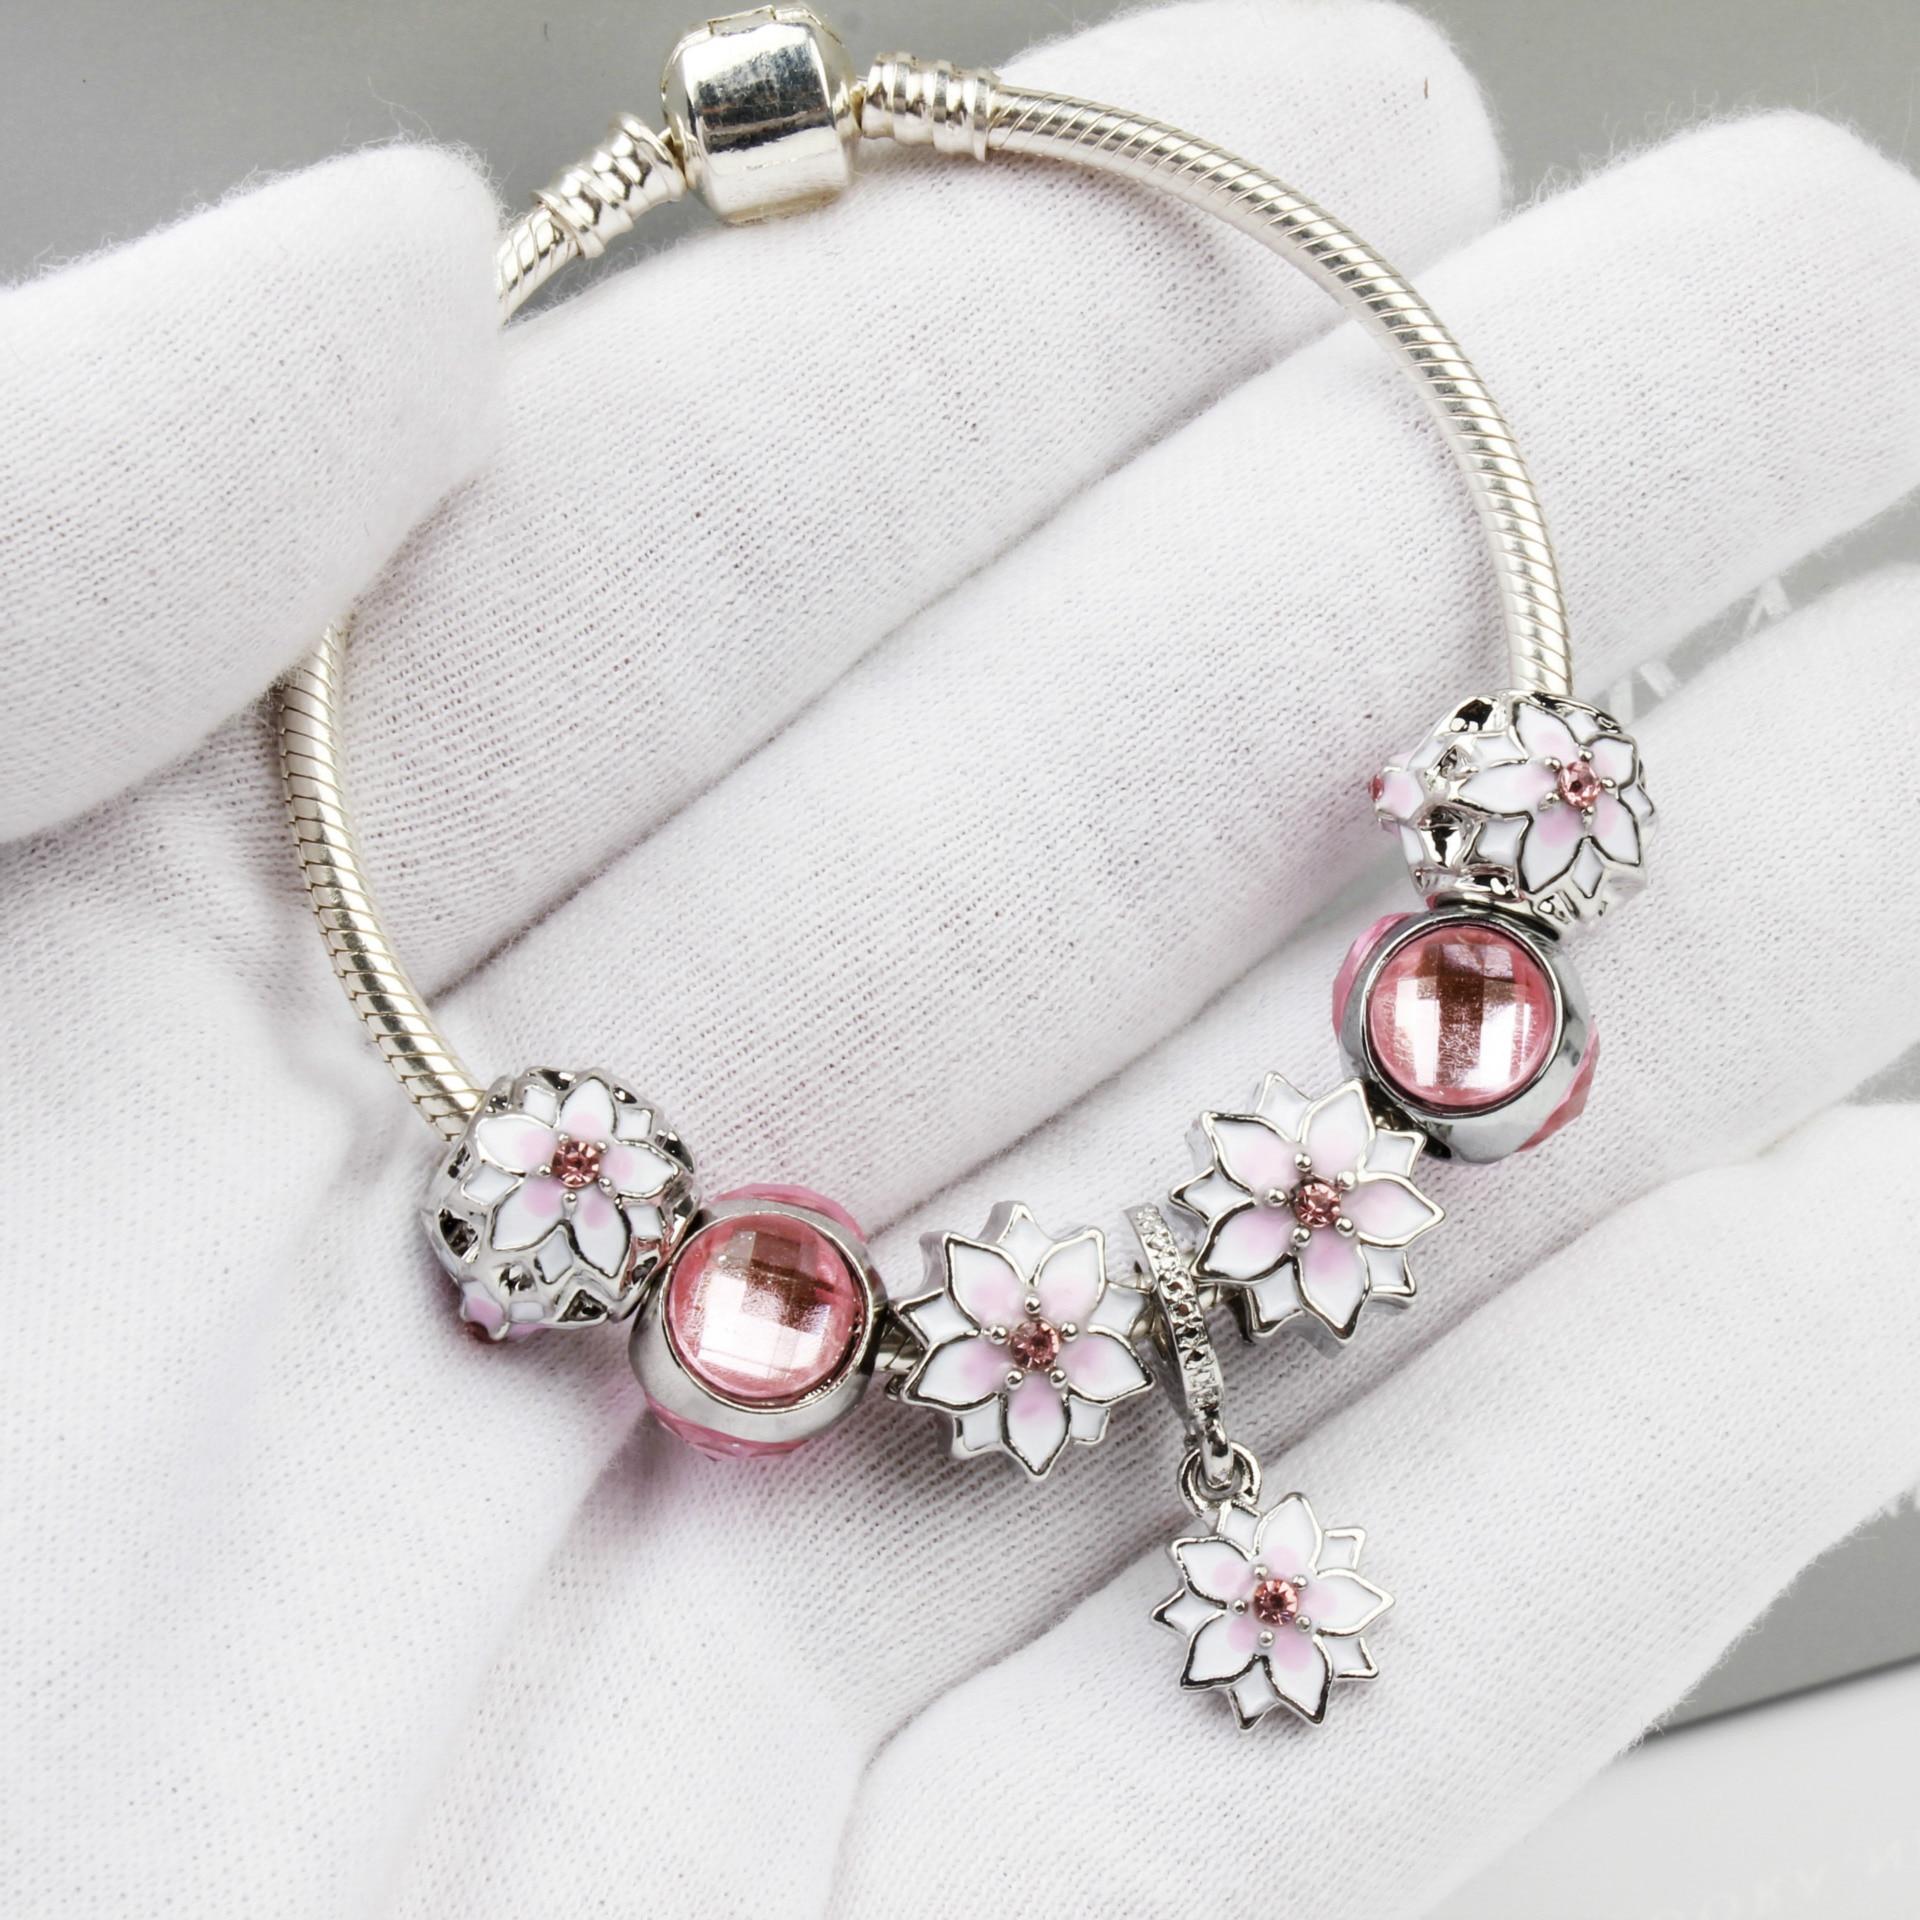 New S925 silver Fit Original Pandoras handmade DIY Pink Magnolia pendant bracelet jewelry crystal charm beads bracelets for Gift(China)